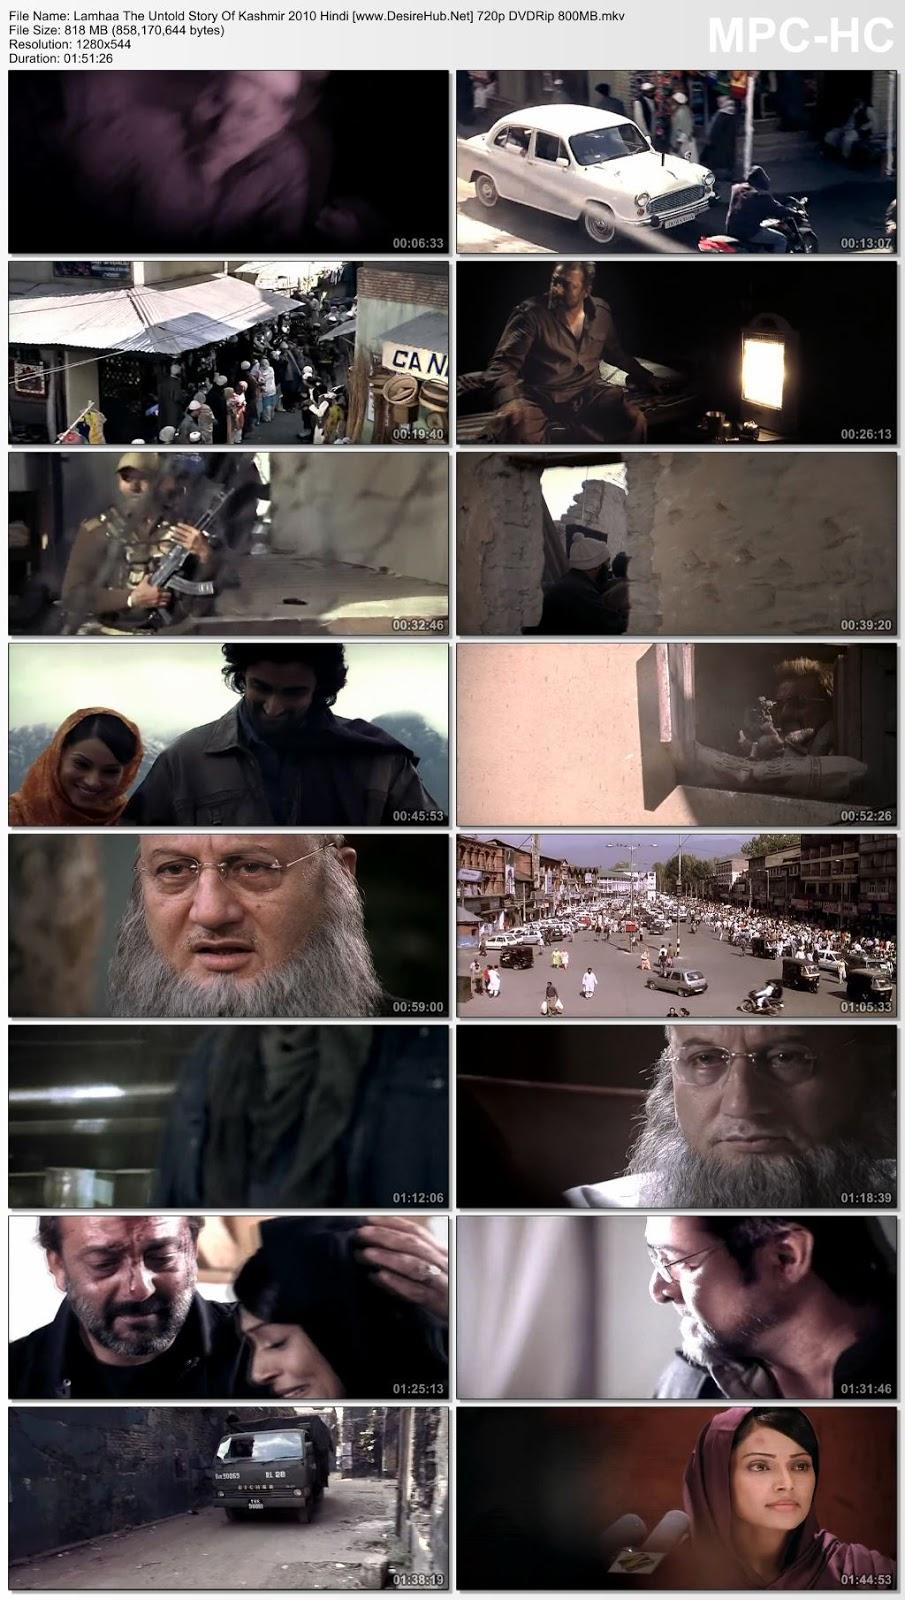 Lamhaa The Untold Story Of Kashmir 2010 Hindi 480p DVDRip 300MB Desirehub